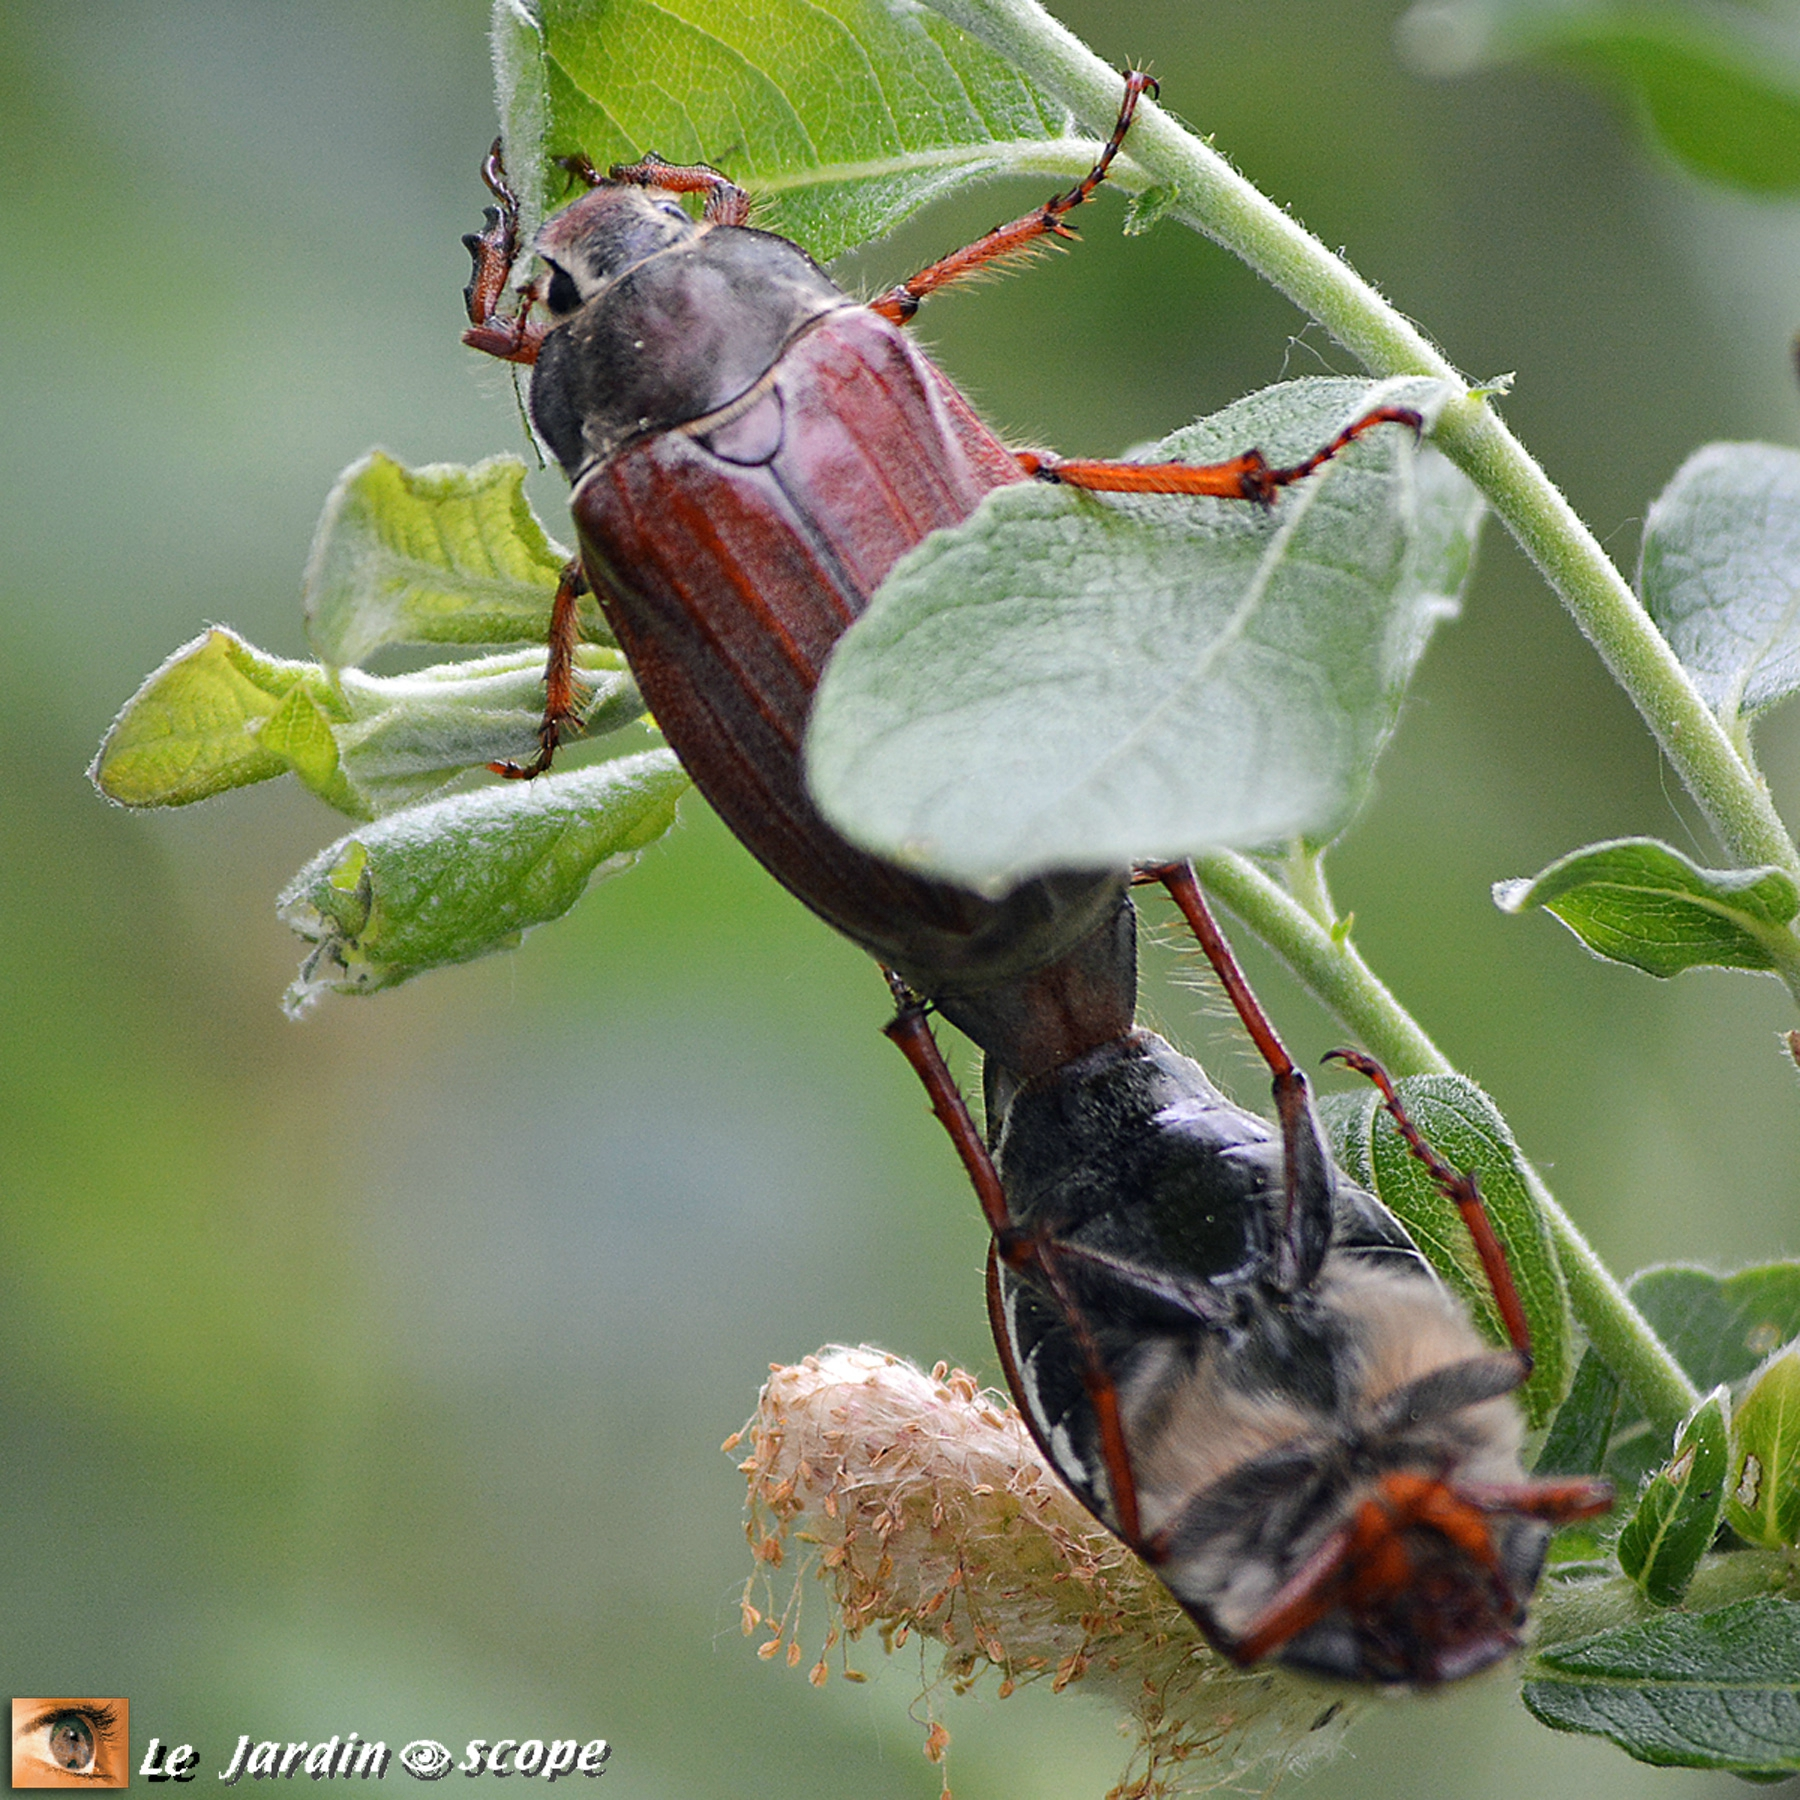 Hannetons communs • Melolontha melolontha (in-copula)